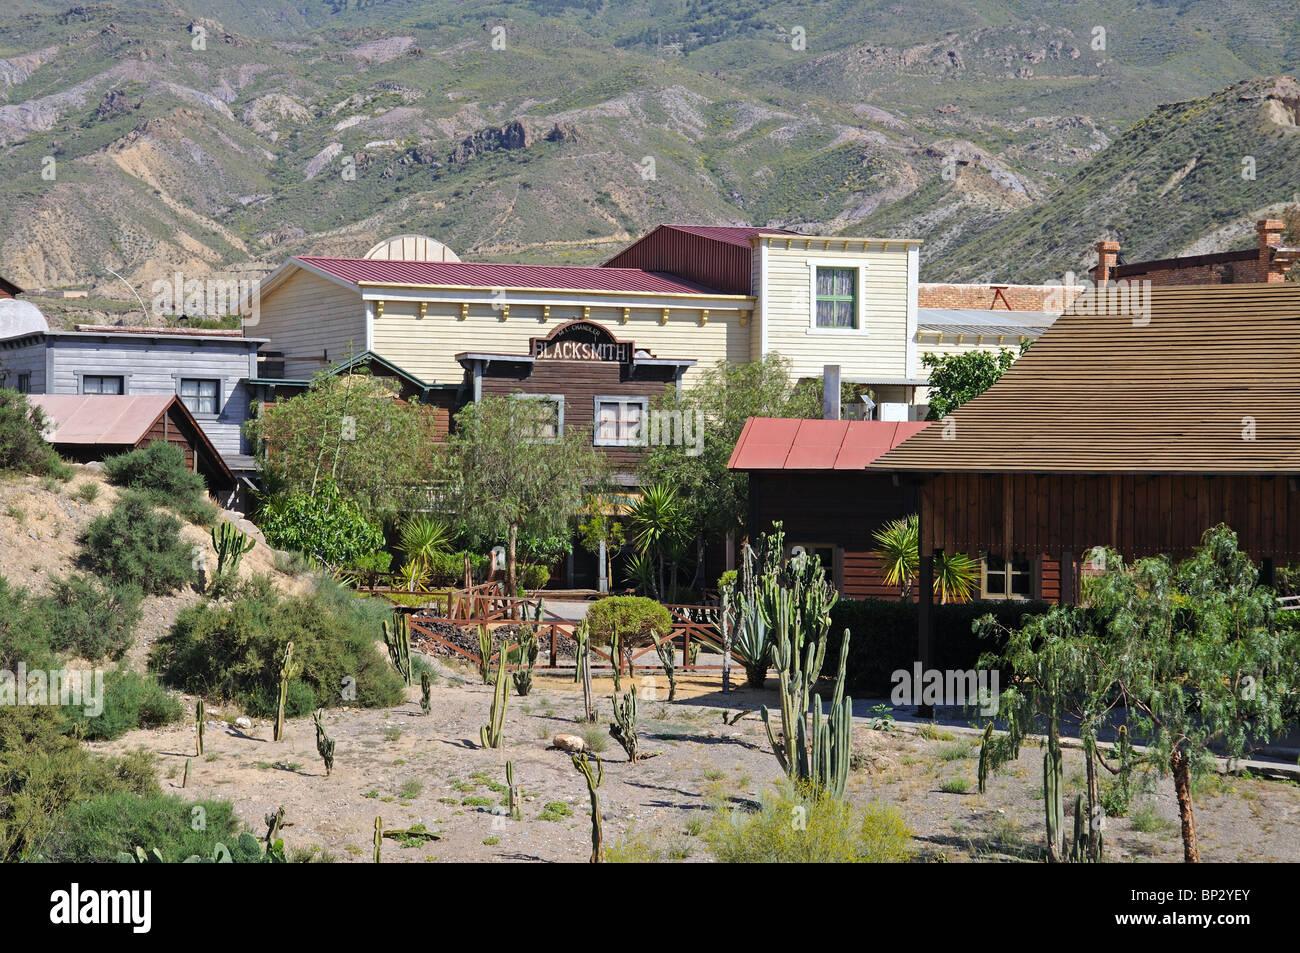 Fort Apache, Mini Hollywood, Tabernas, Almeria Province, Andalucia, Spain, Western Europe. Stock Photo